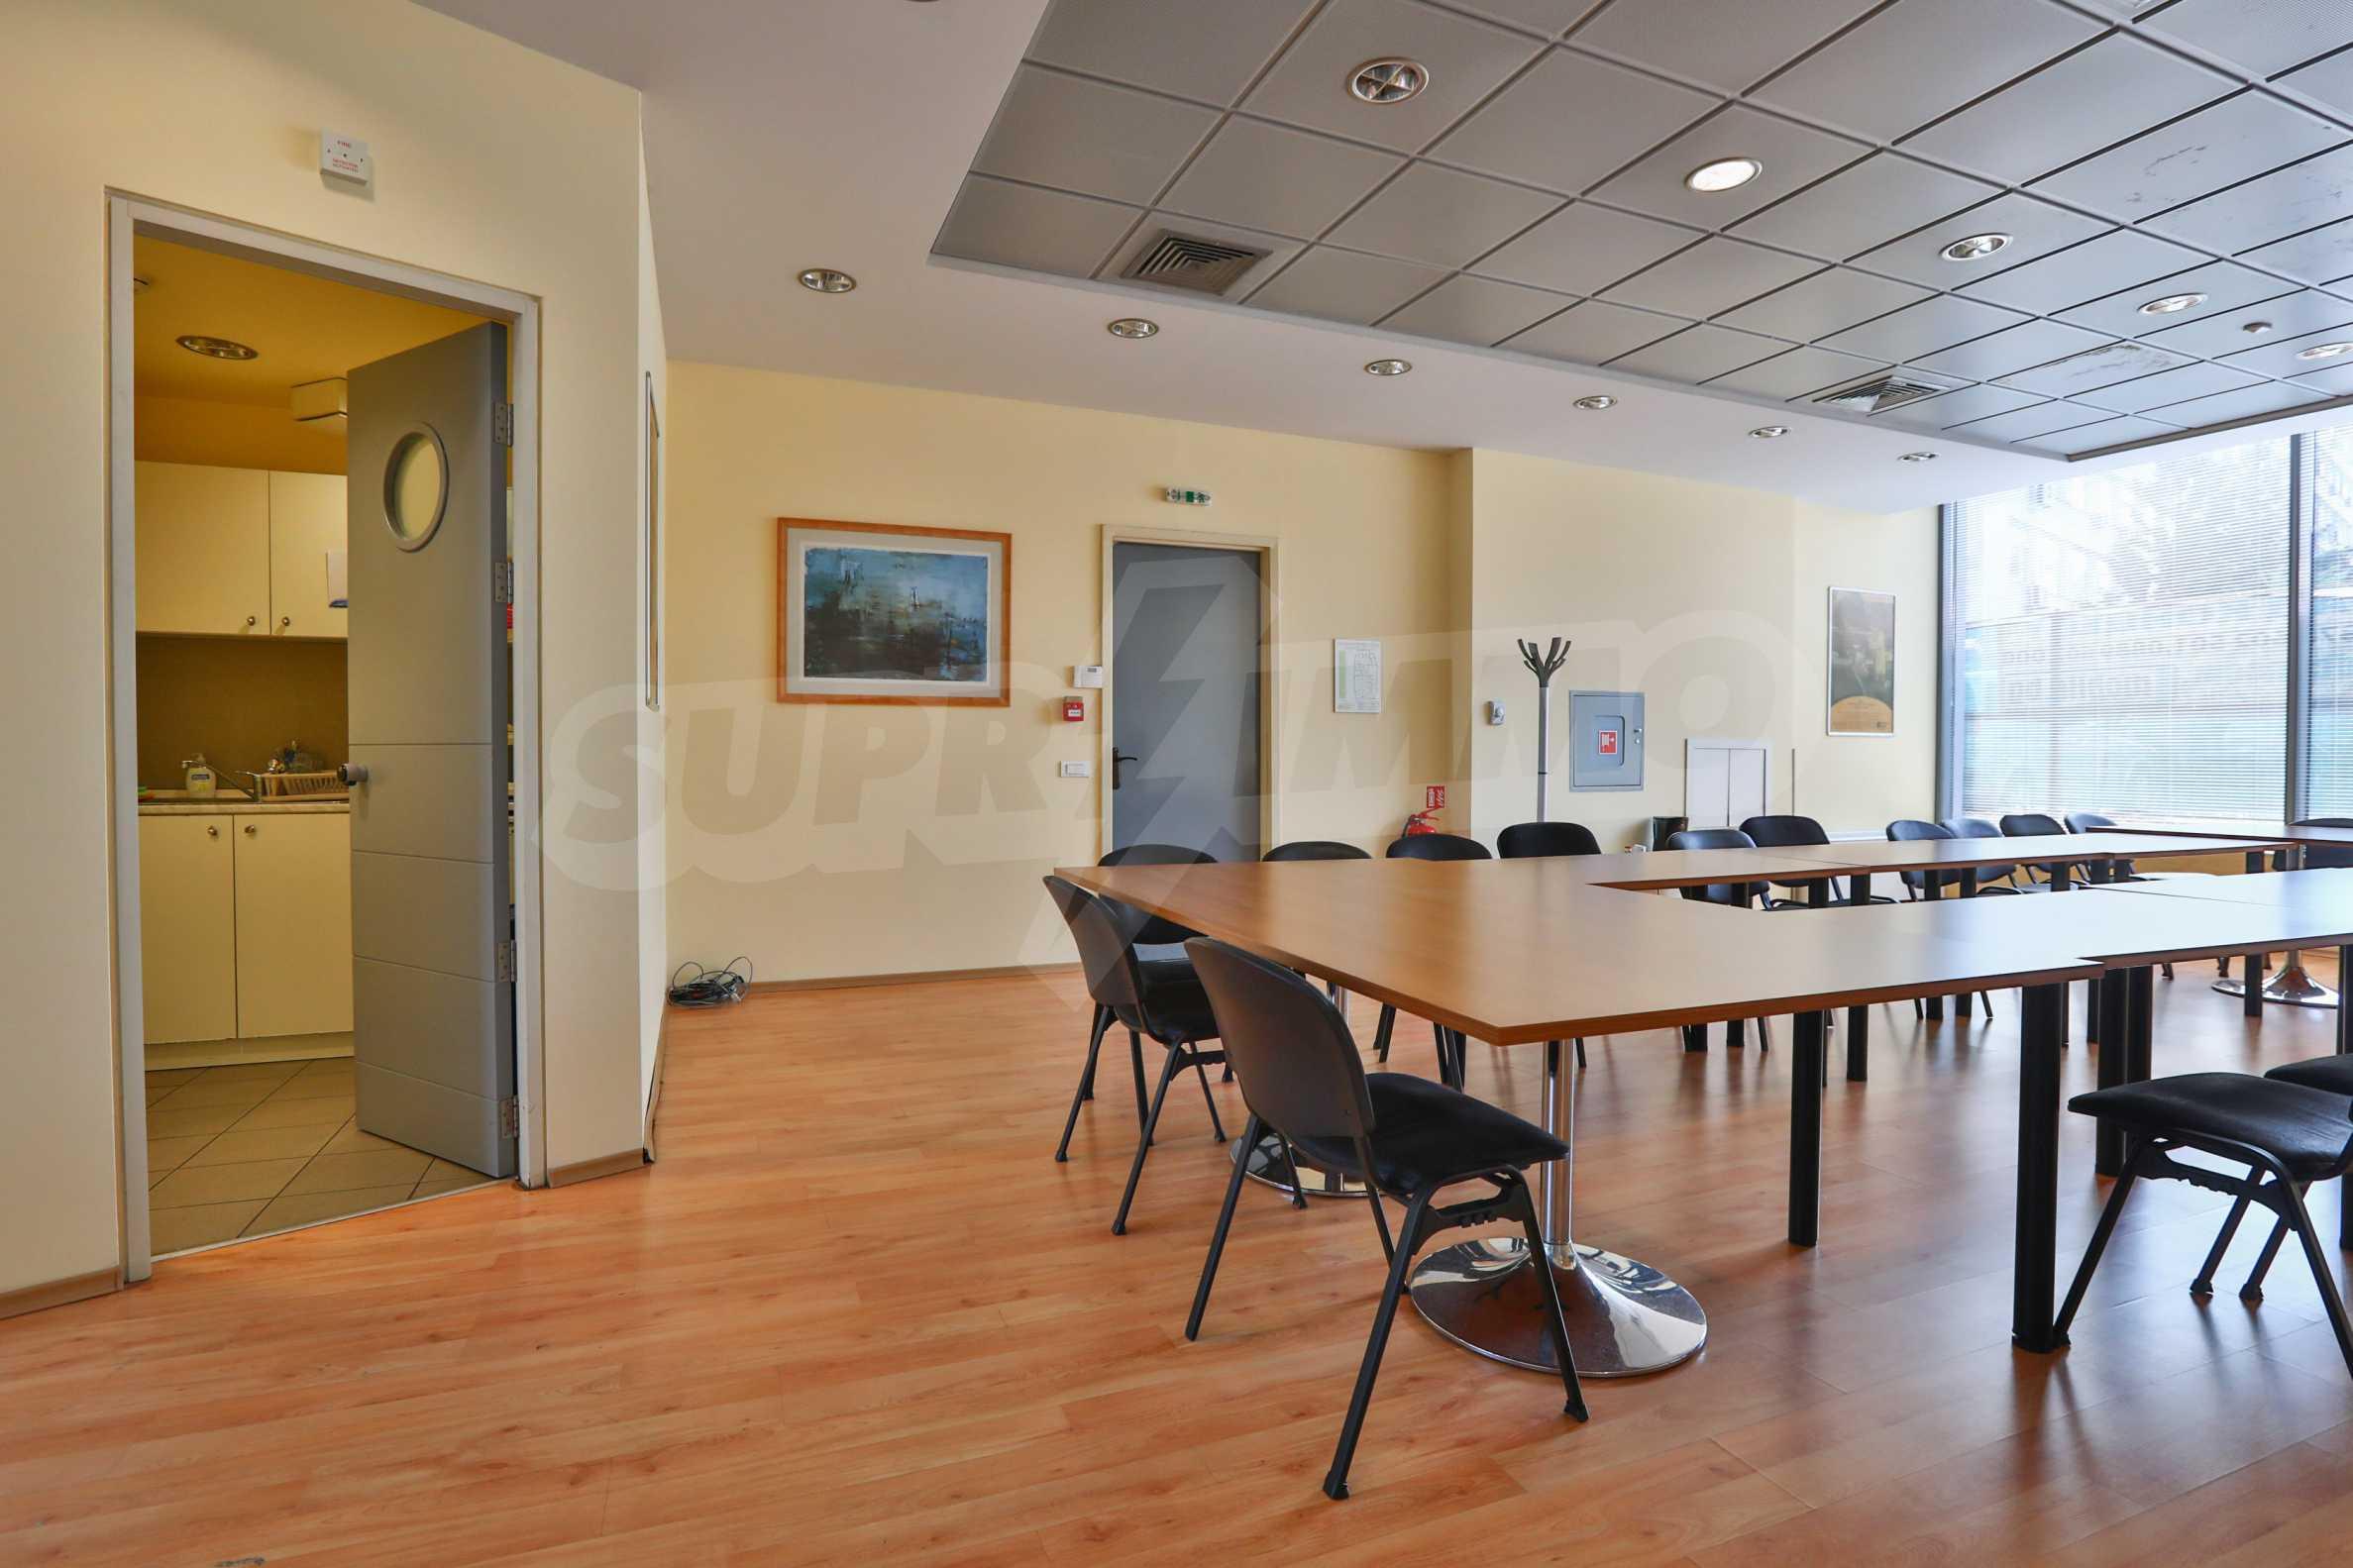 Офис в бизнес сграда висок клас на бул. Цариградско шосе 3